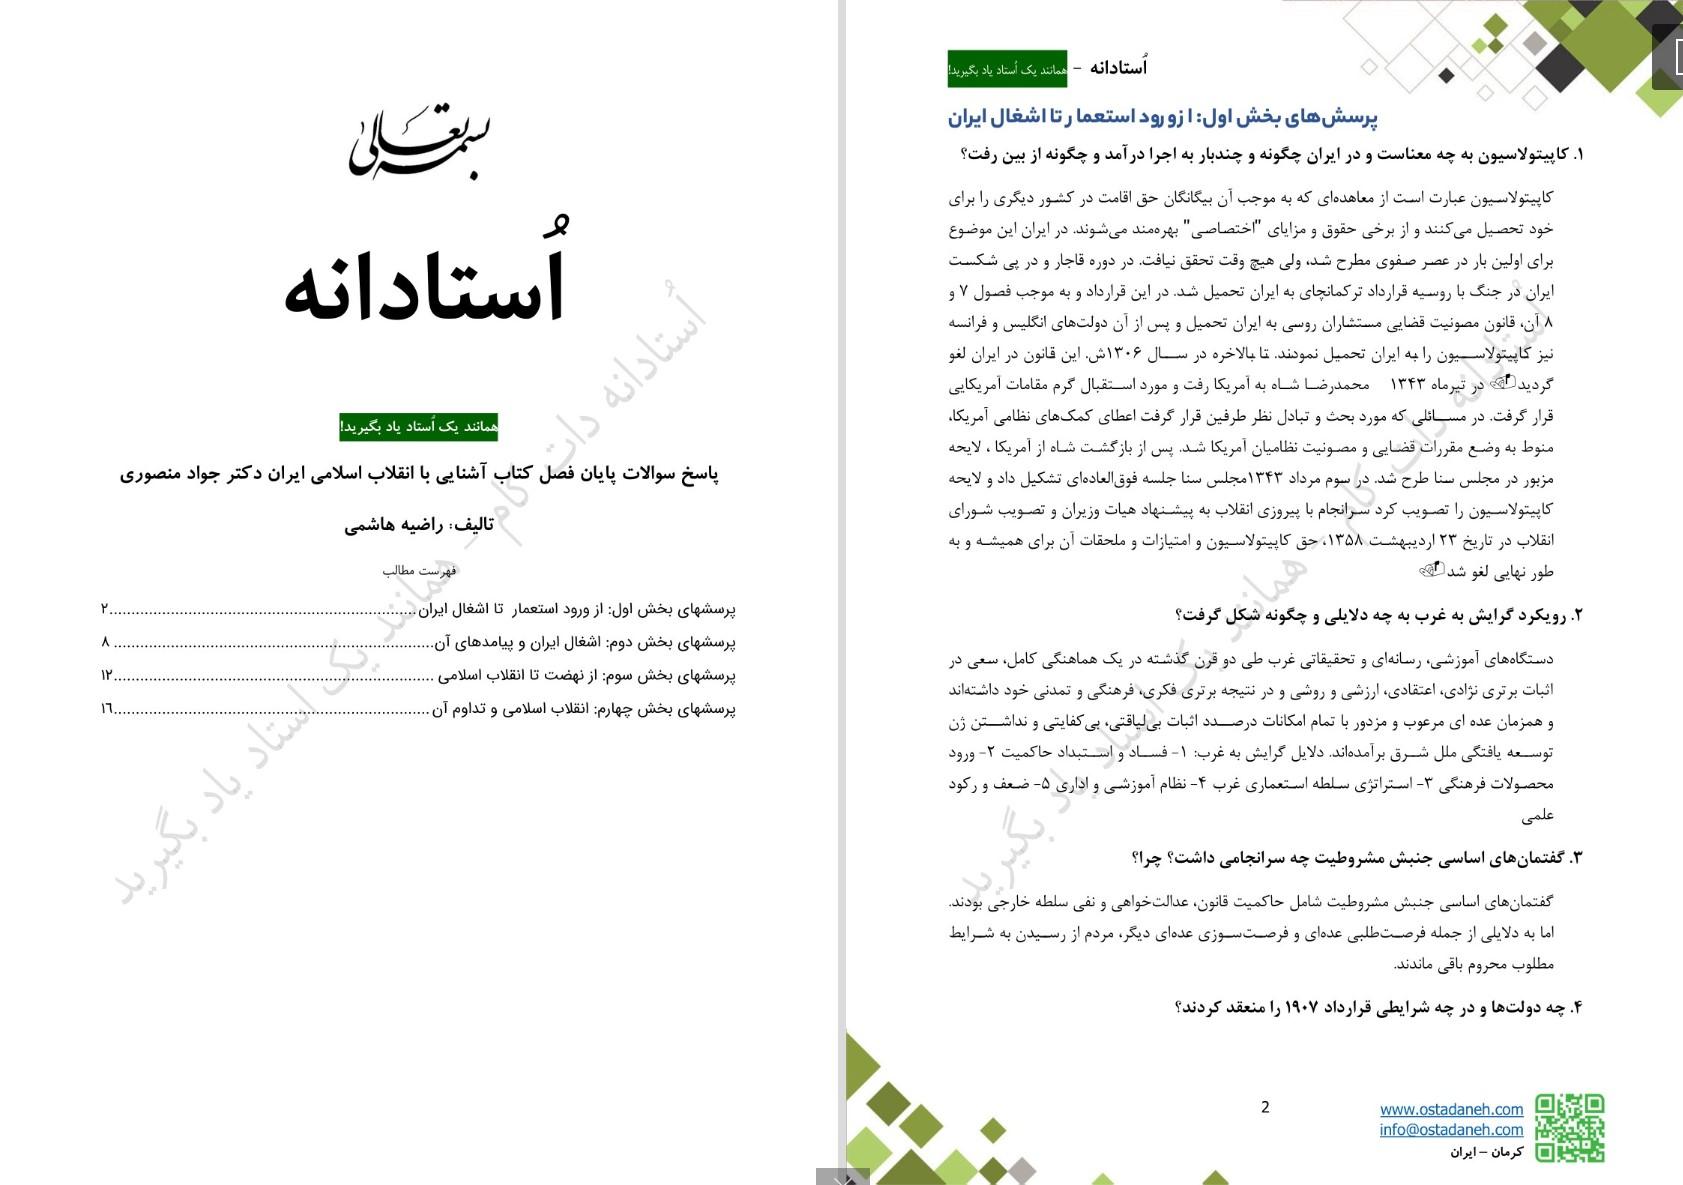 تصویر جواب سوالات پایان فصل انقلاب اسلامی دکتر جواد منصوری